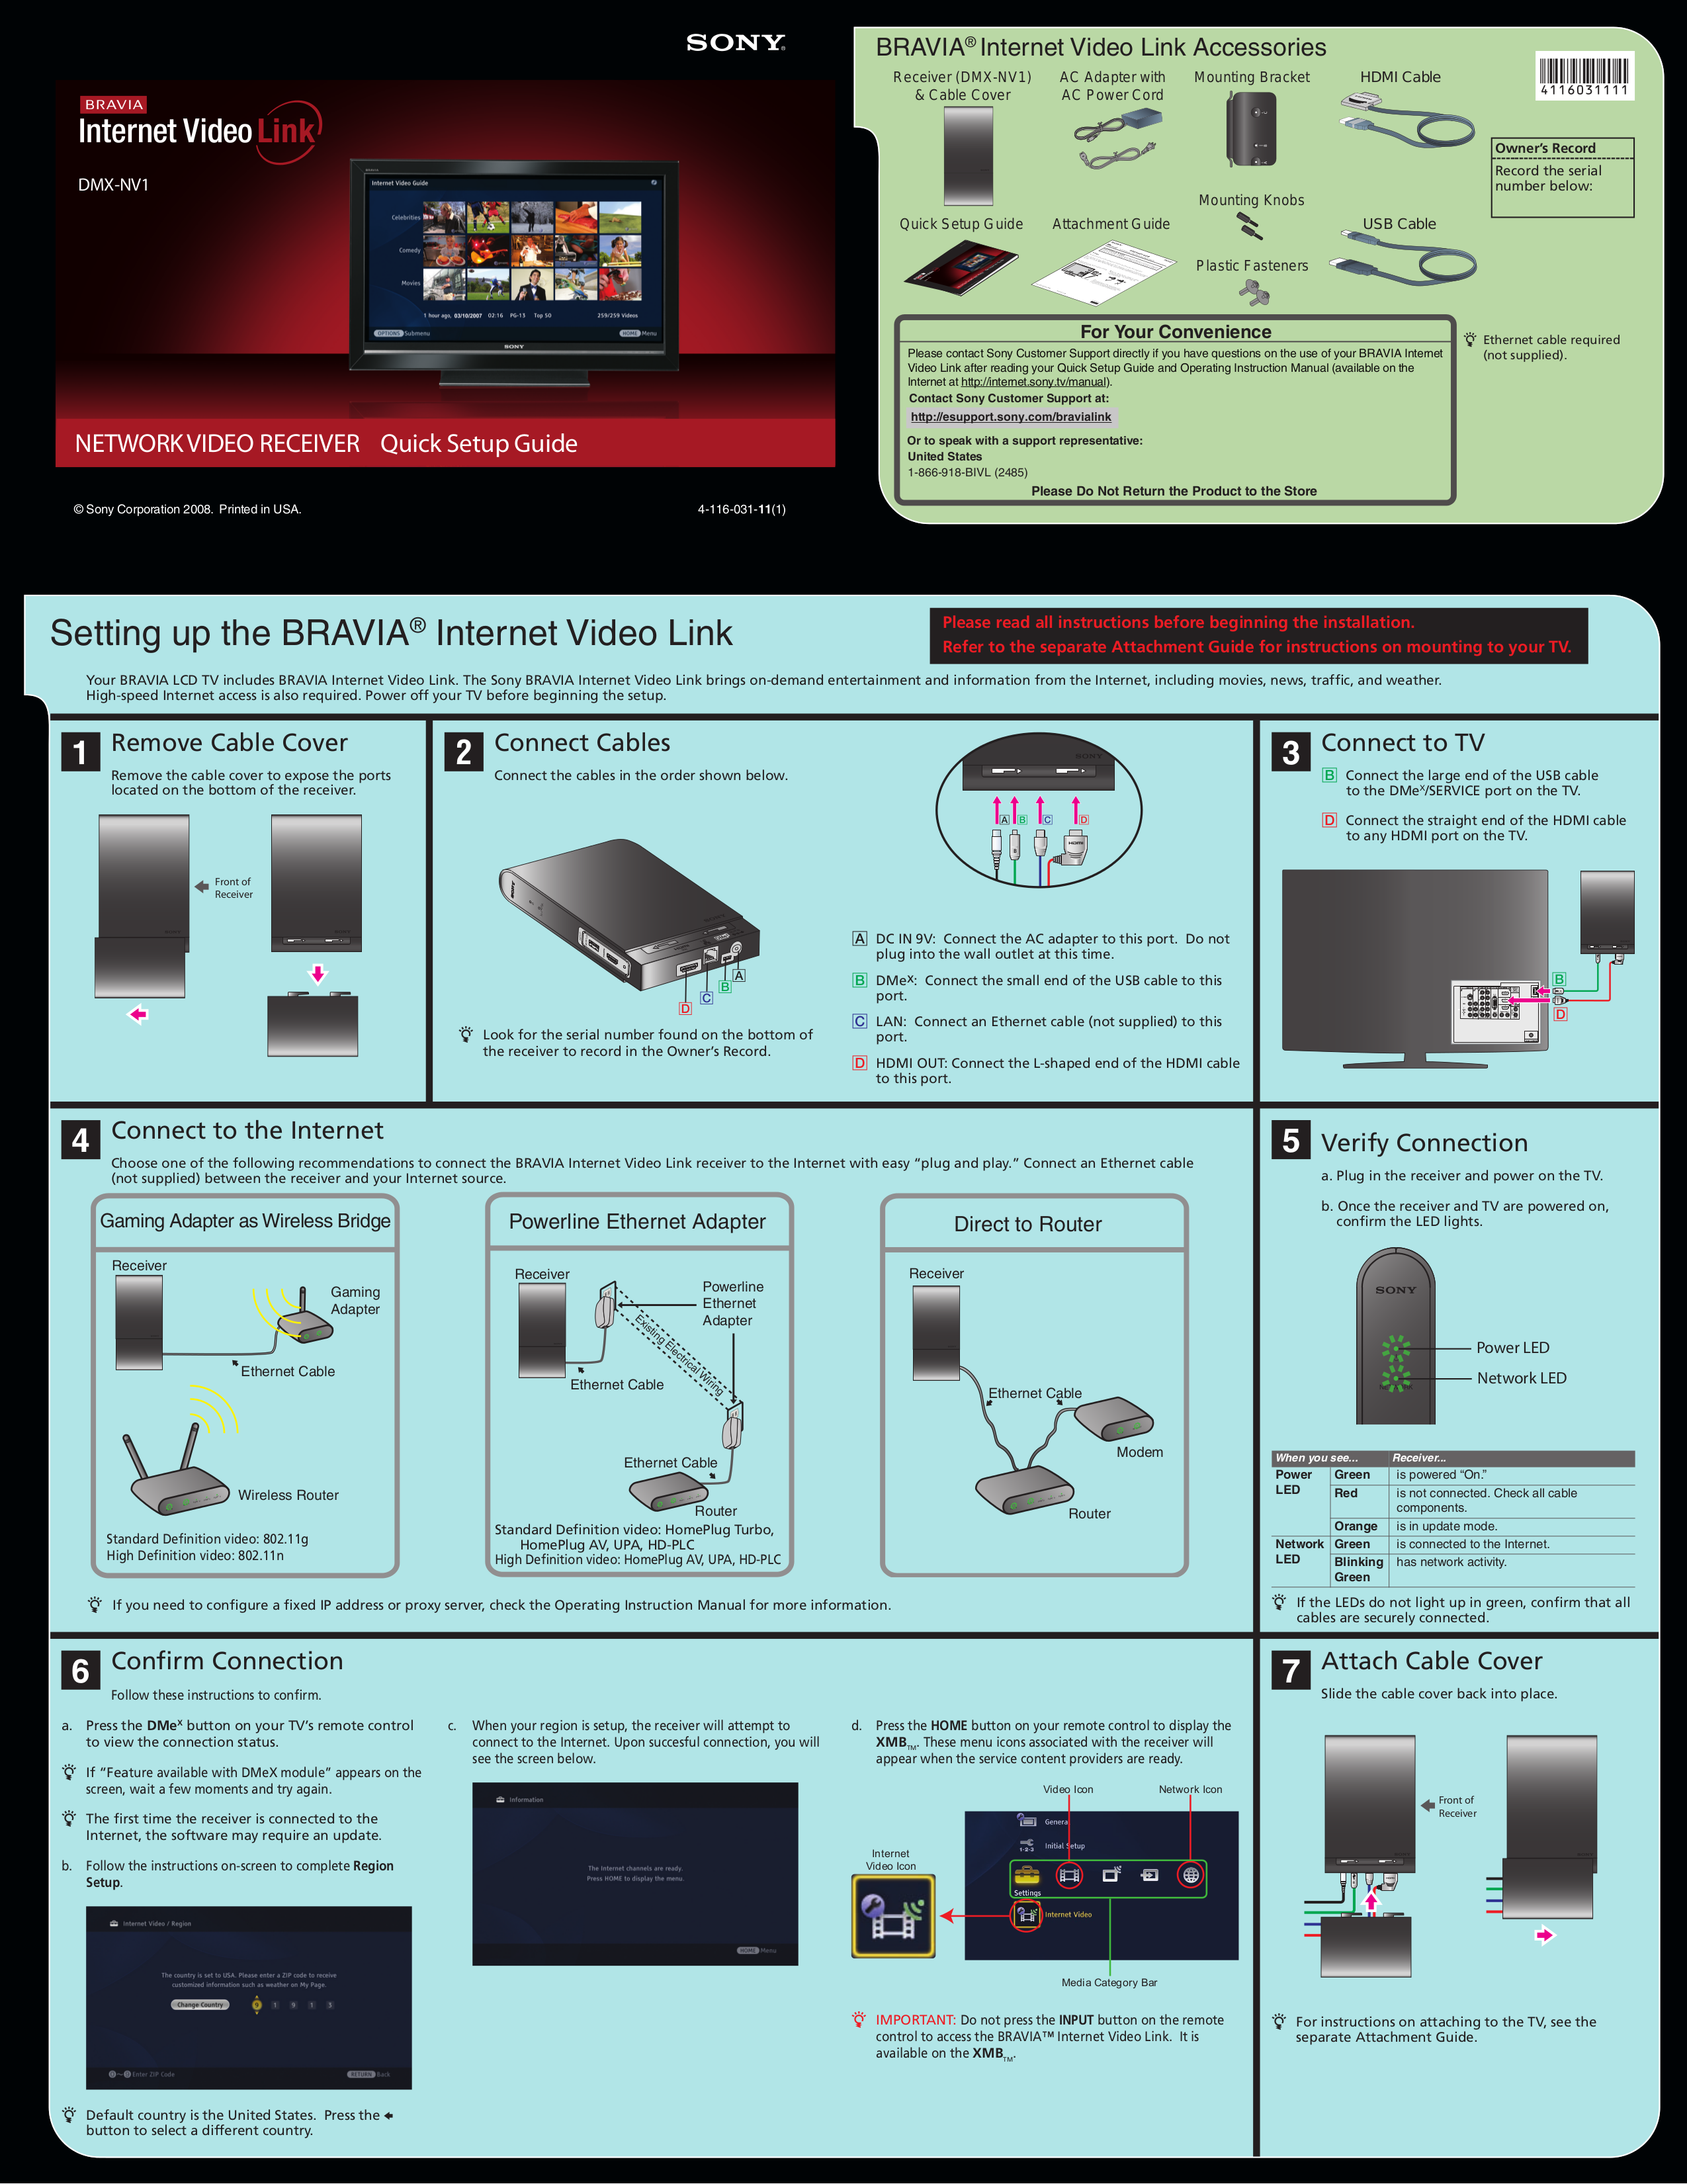 spaj 140 c manual pdf